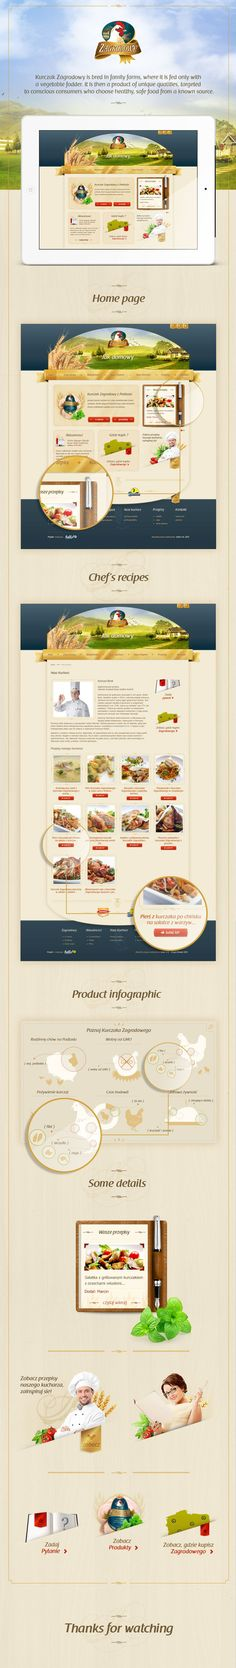 Zagrodowy.pl / Hello! Studio / #food #green #gold